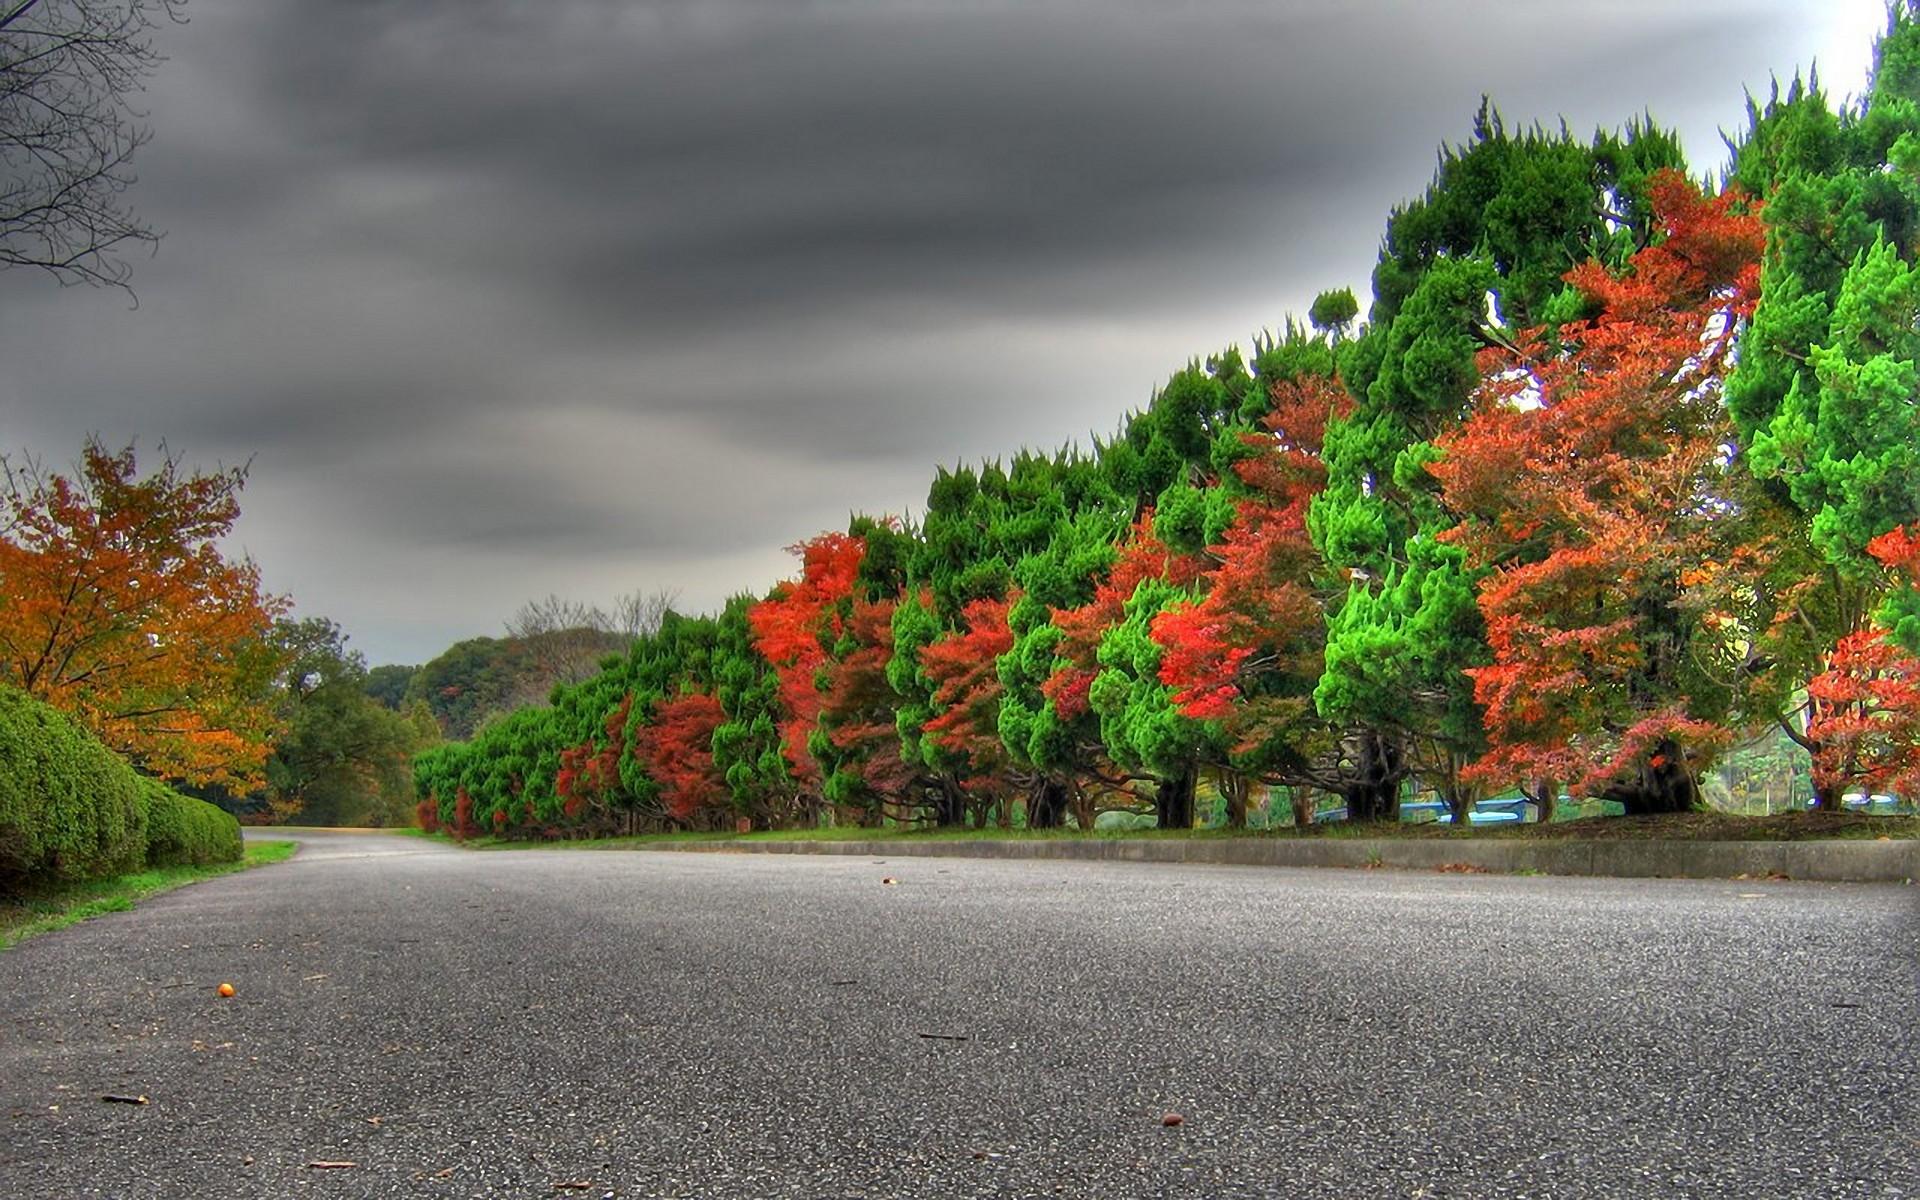 осень, дорога, асфальт